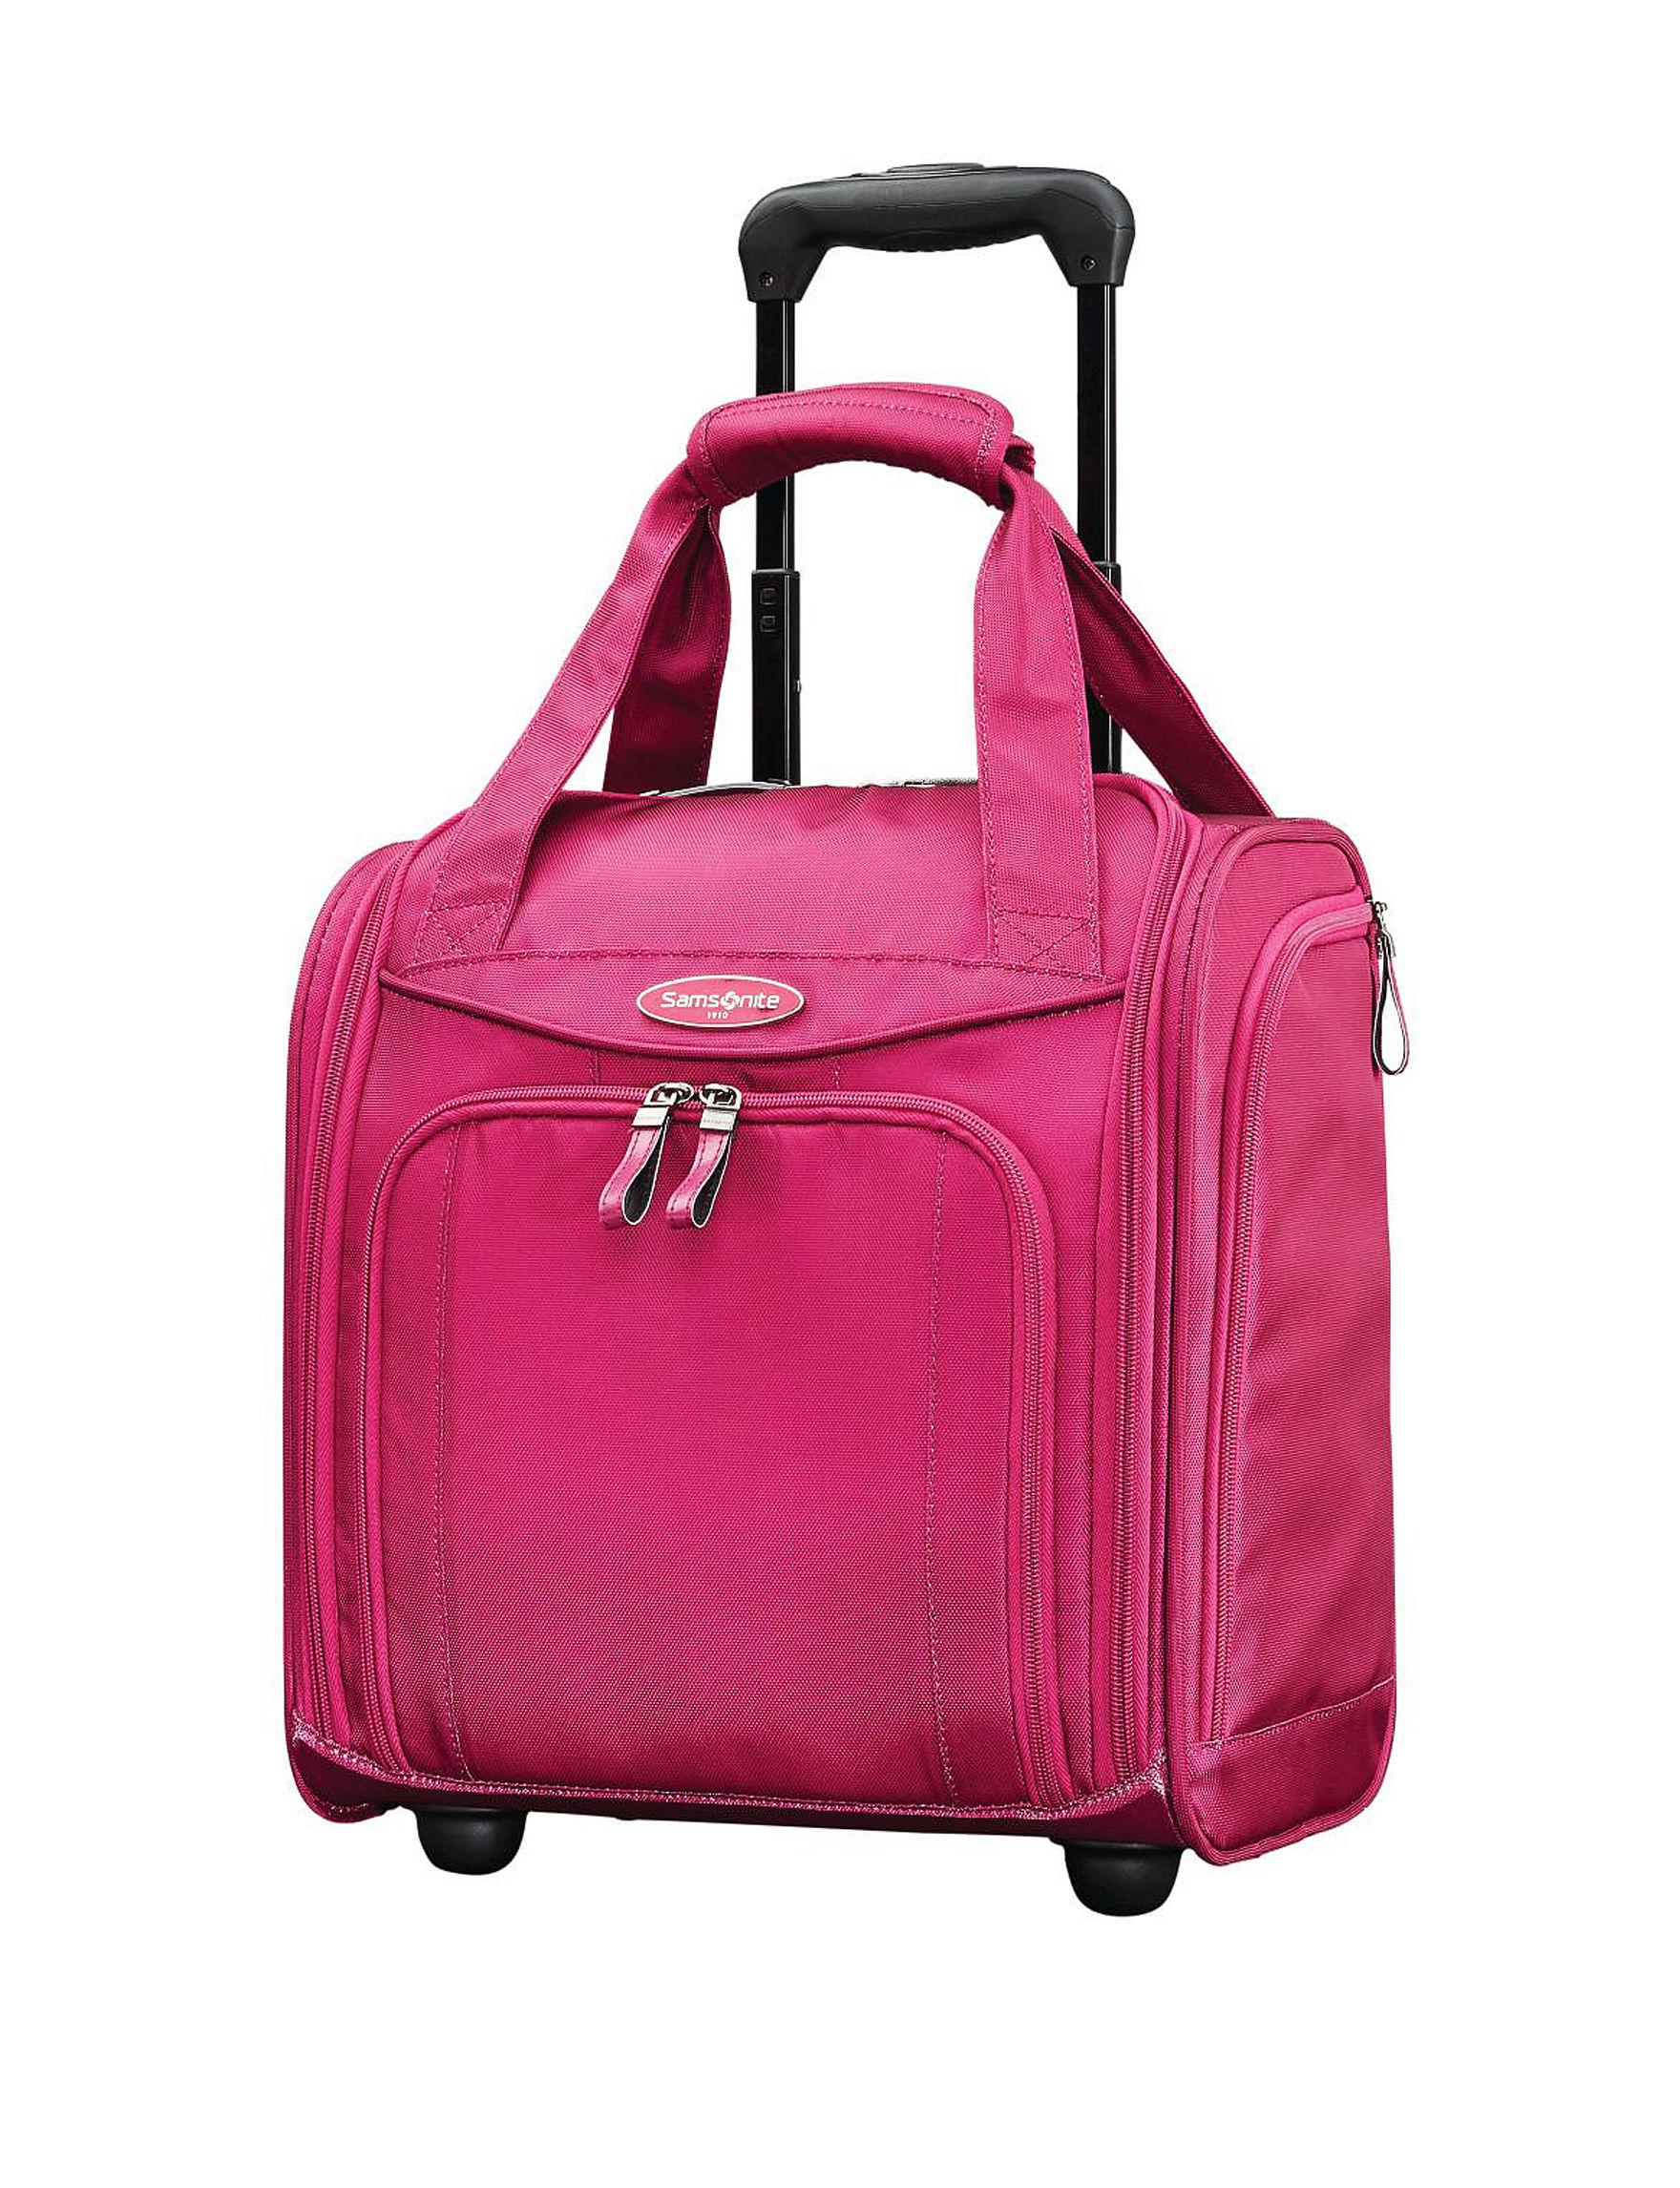 Samsonite Pink Softside Carry On Luggage